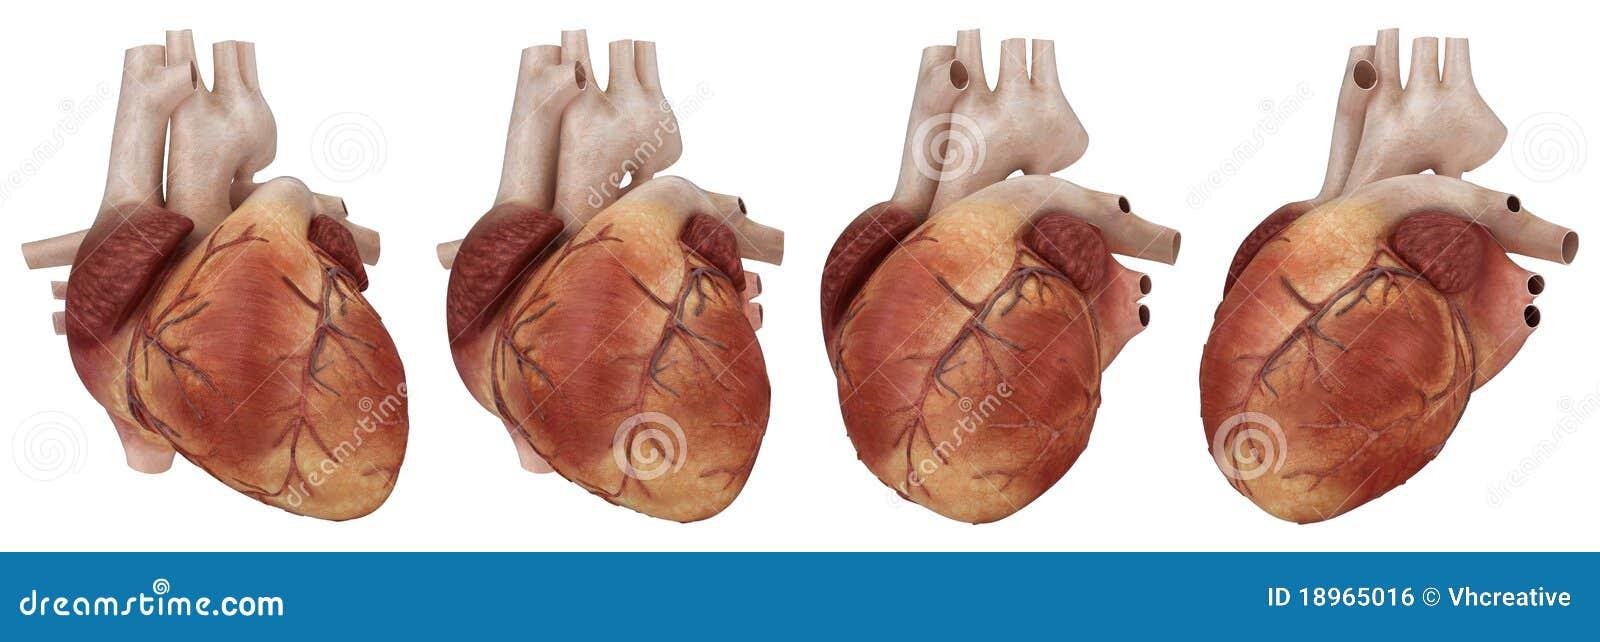 Human Heart And Coronary Arteries Stock Illustration - Illustration ...